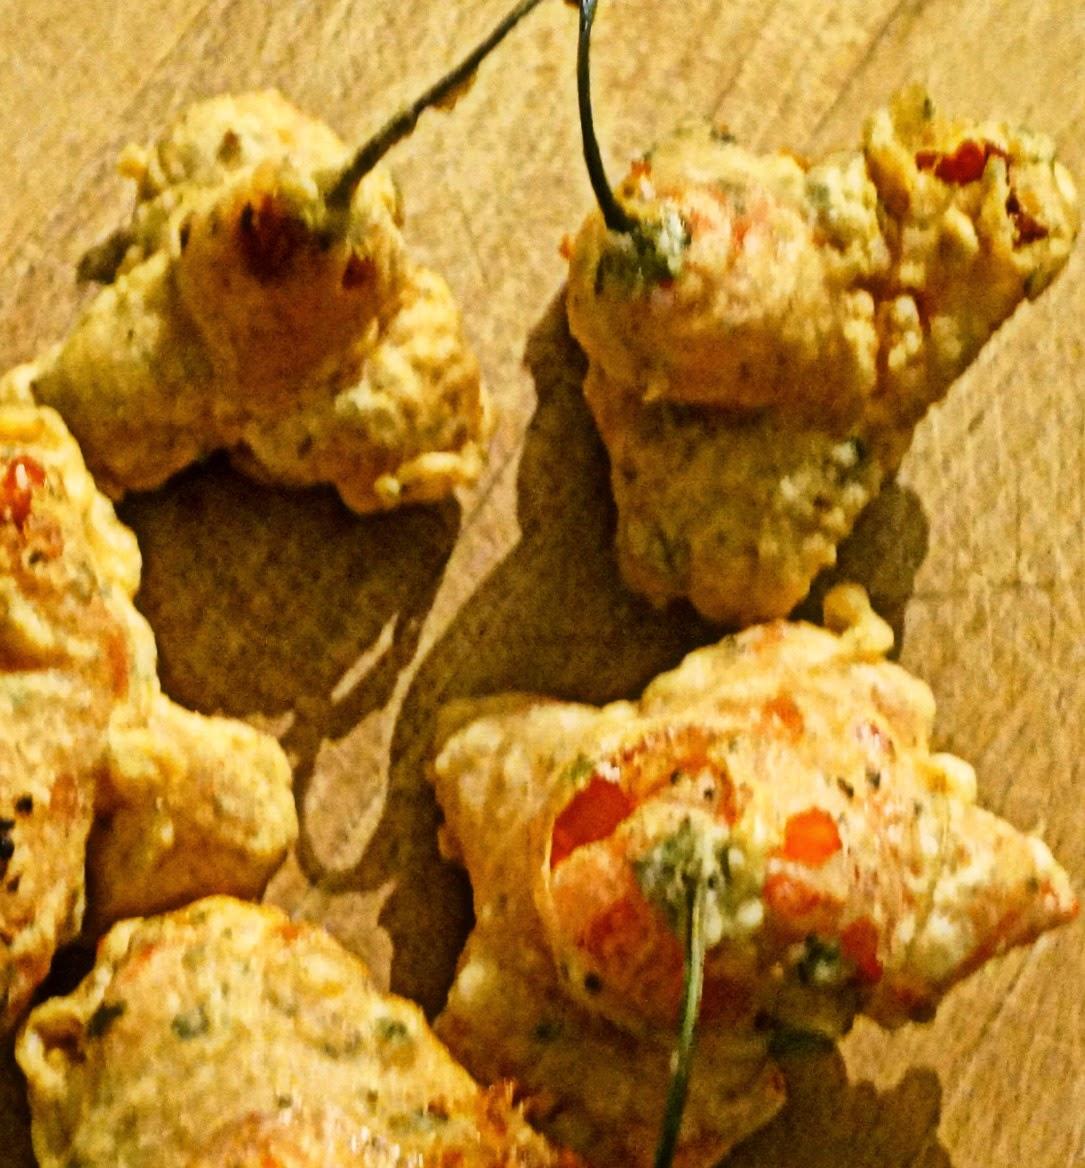 http://cupcakeluvs.blogspot.dk/2014/11/fyldte-klokkeblomst-chili-la-tempura.html